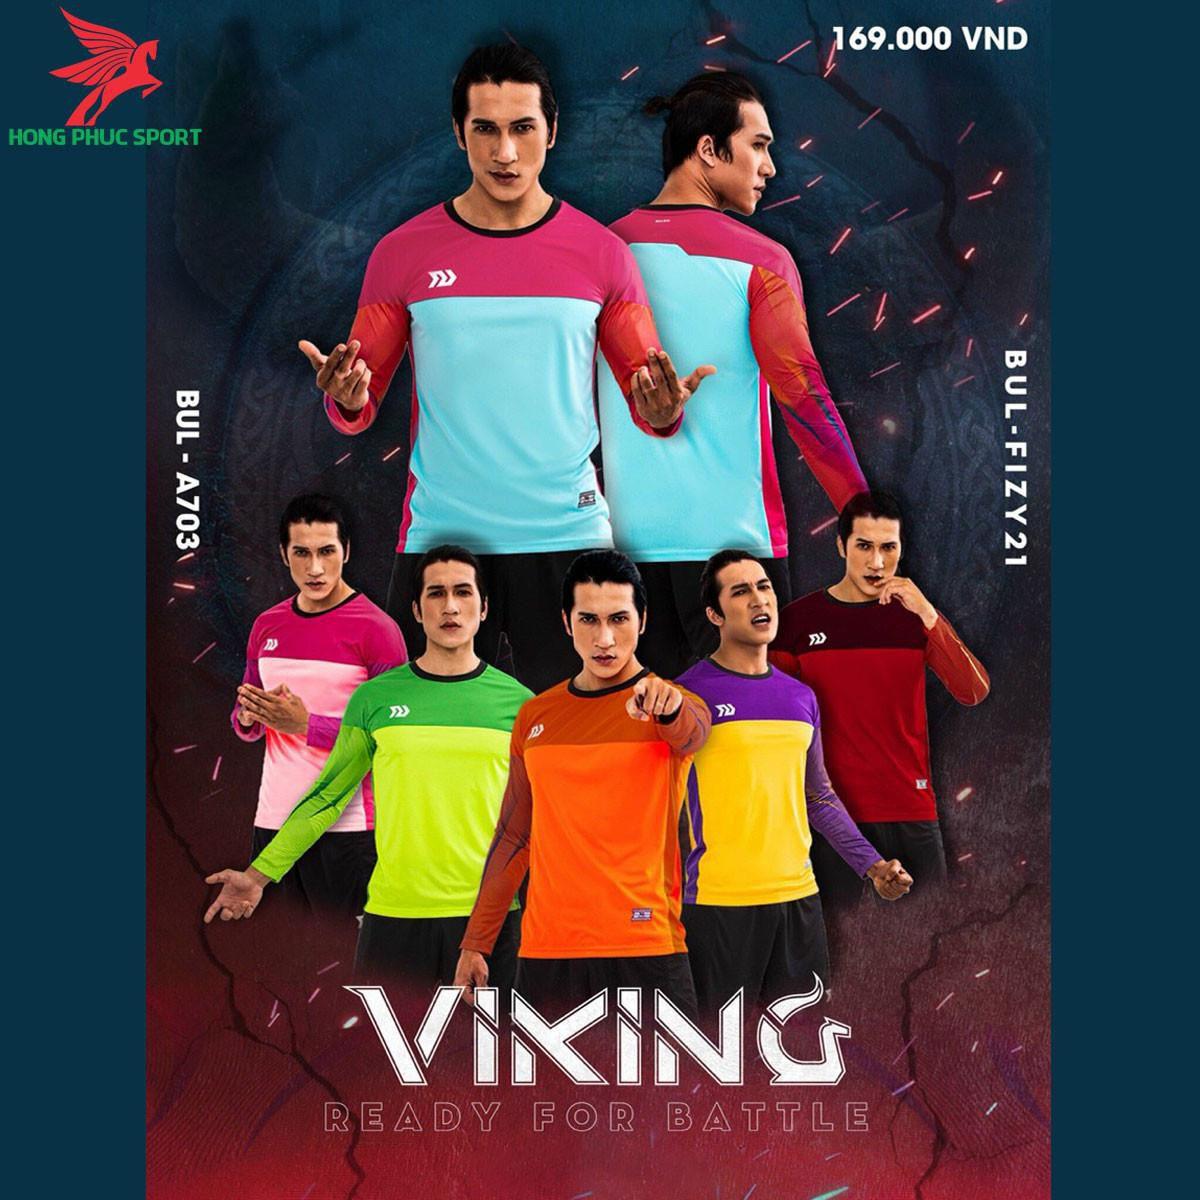 https://cdn.hongphucsport.com/unsafe/s4.shopbay.vn/files/285/ao-thu-mon-khong-logo-bulbal-viking-60515cd768375.jpg